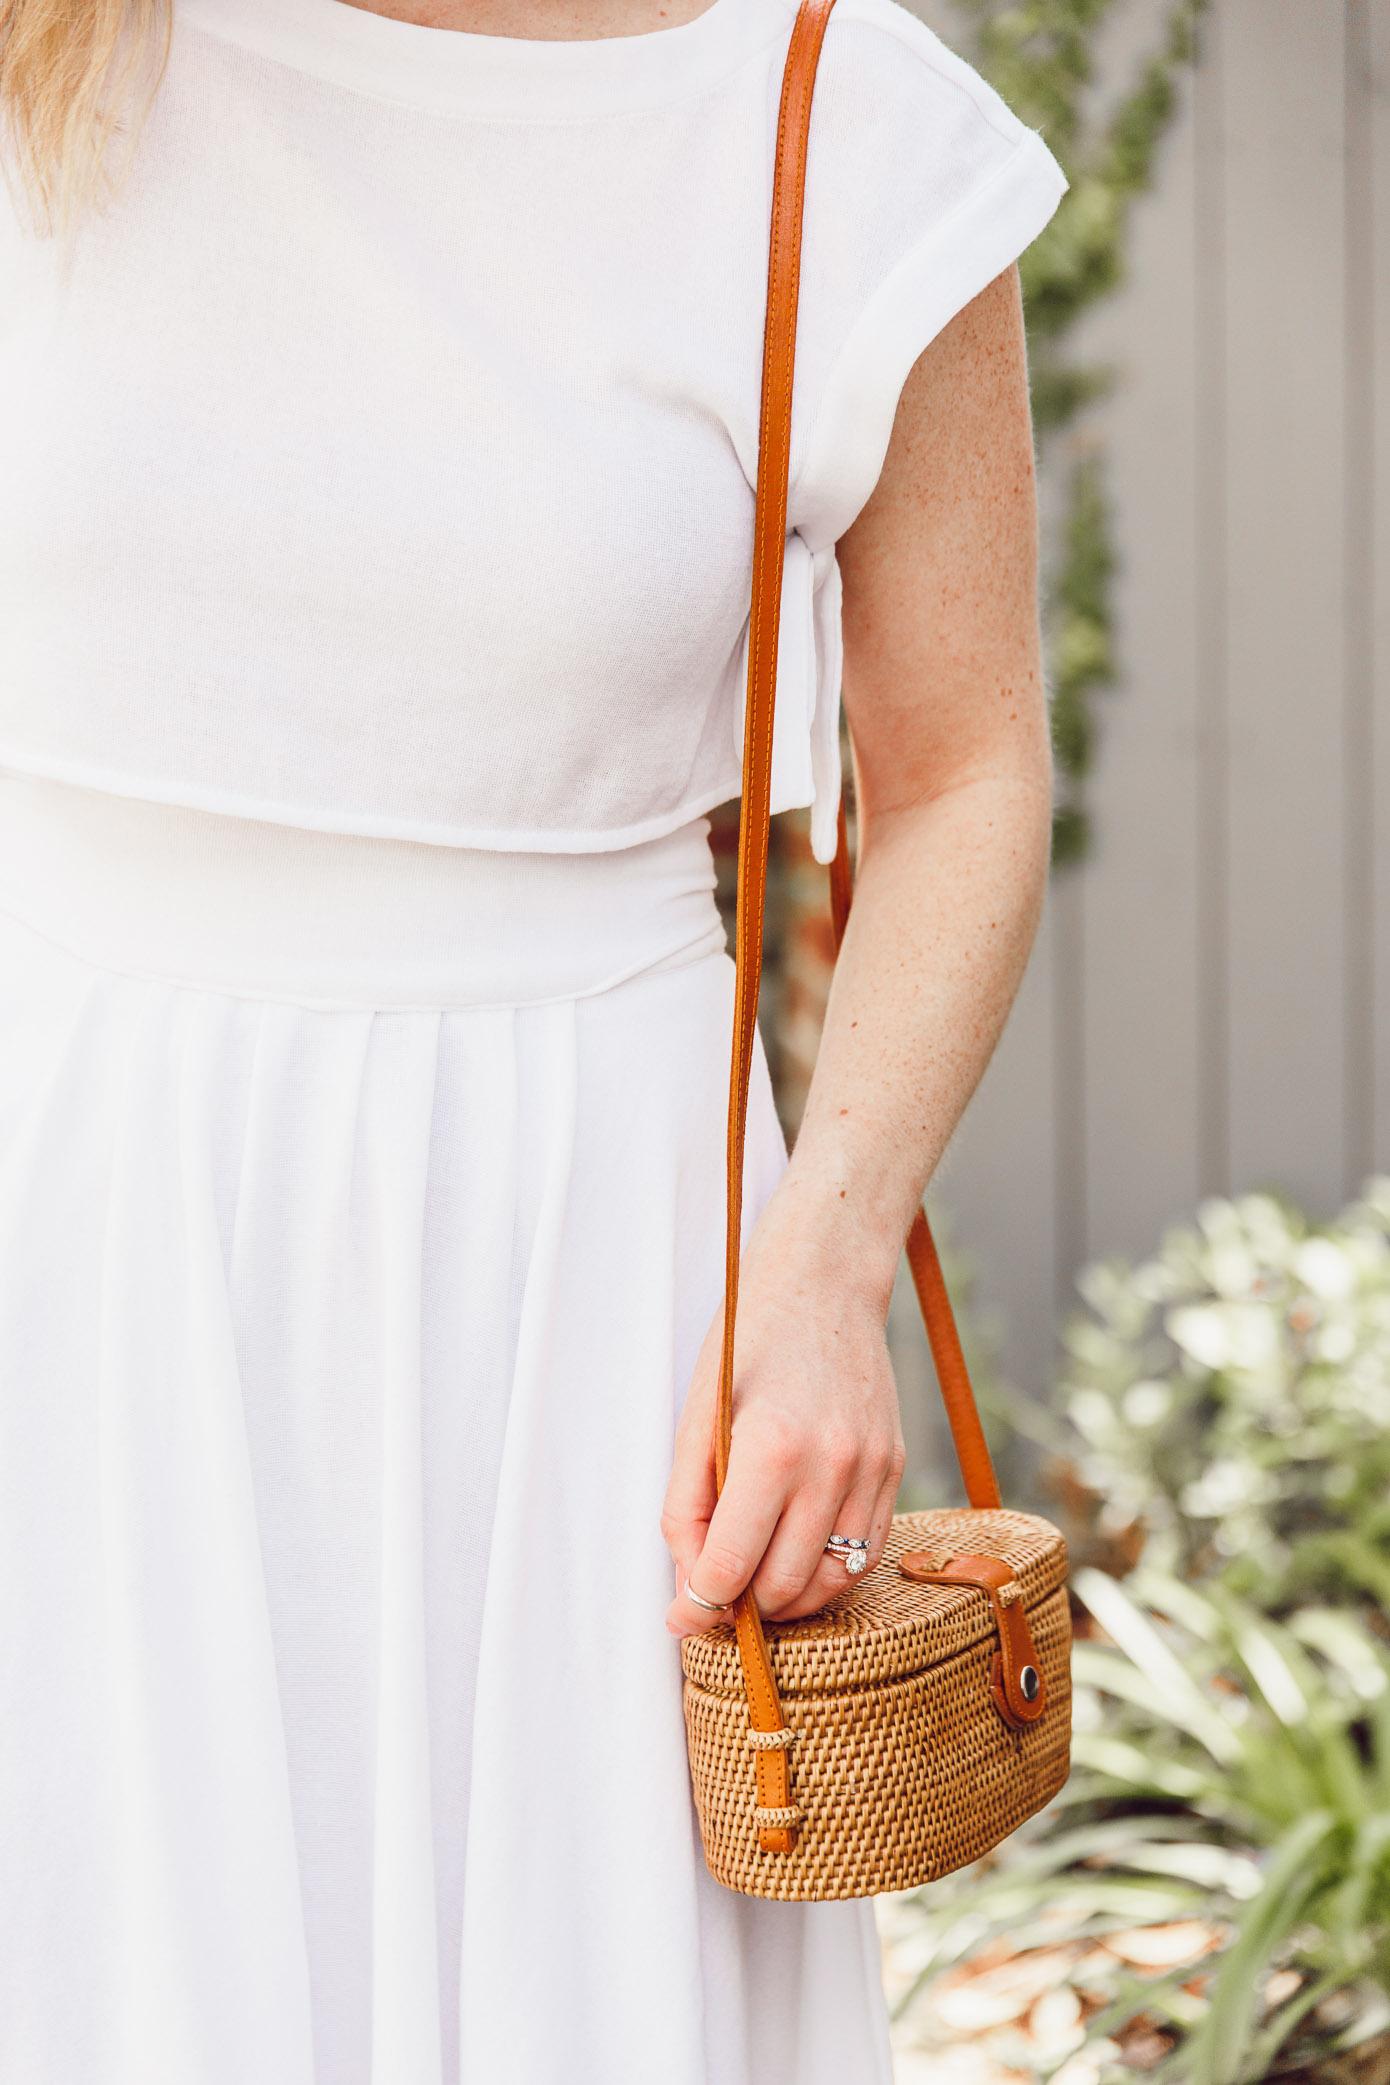 Rattan Handbags for Summer | Louella Reese